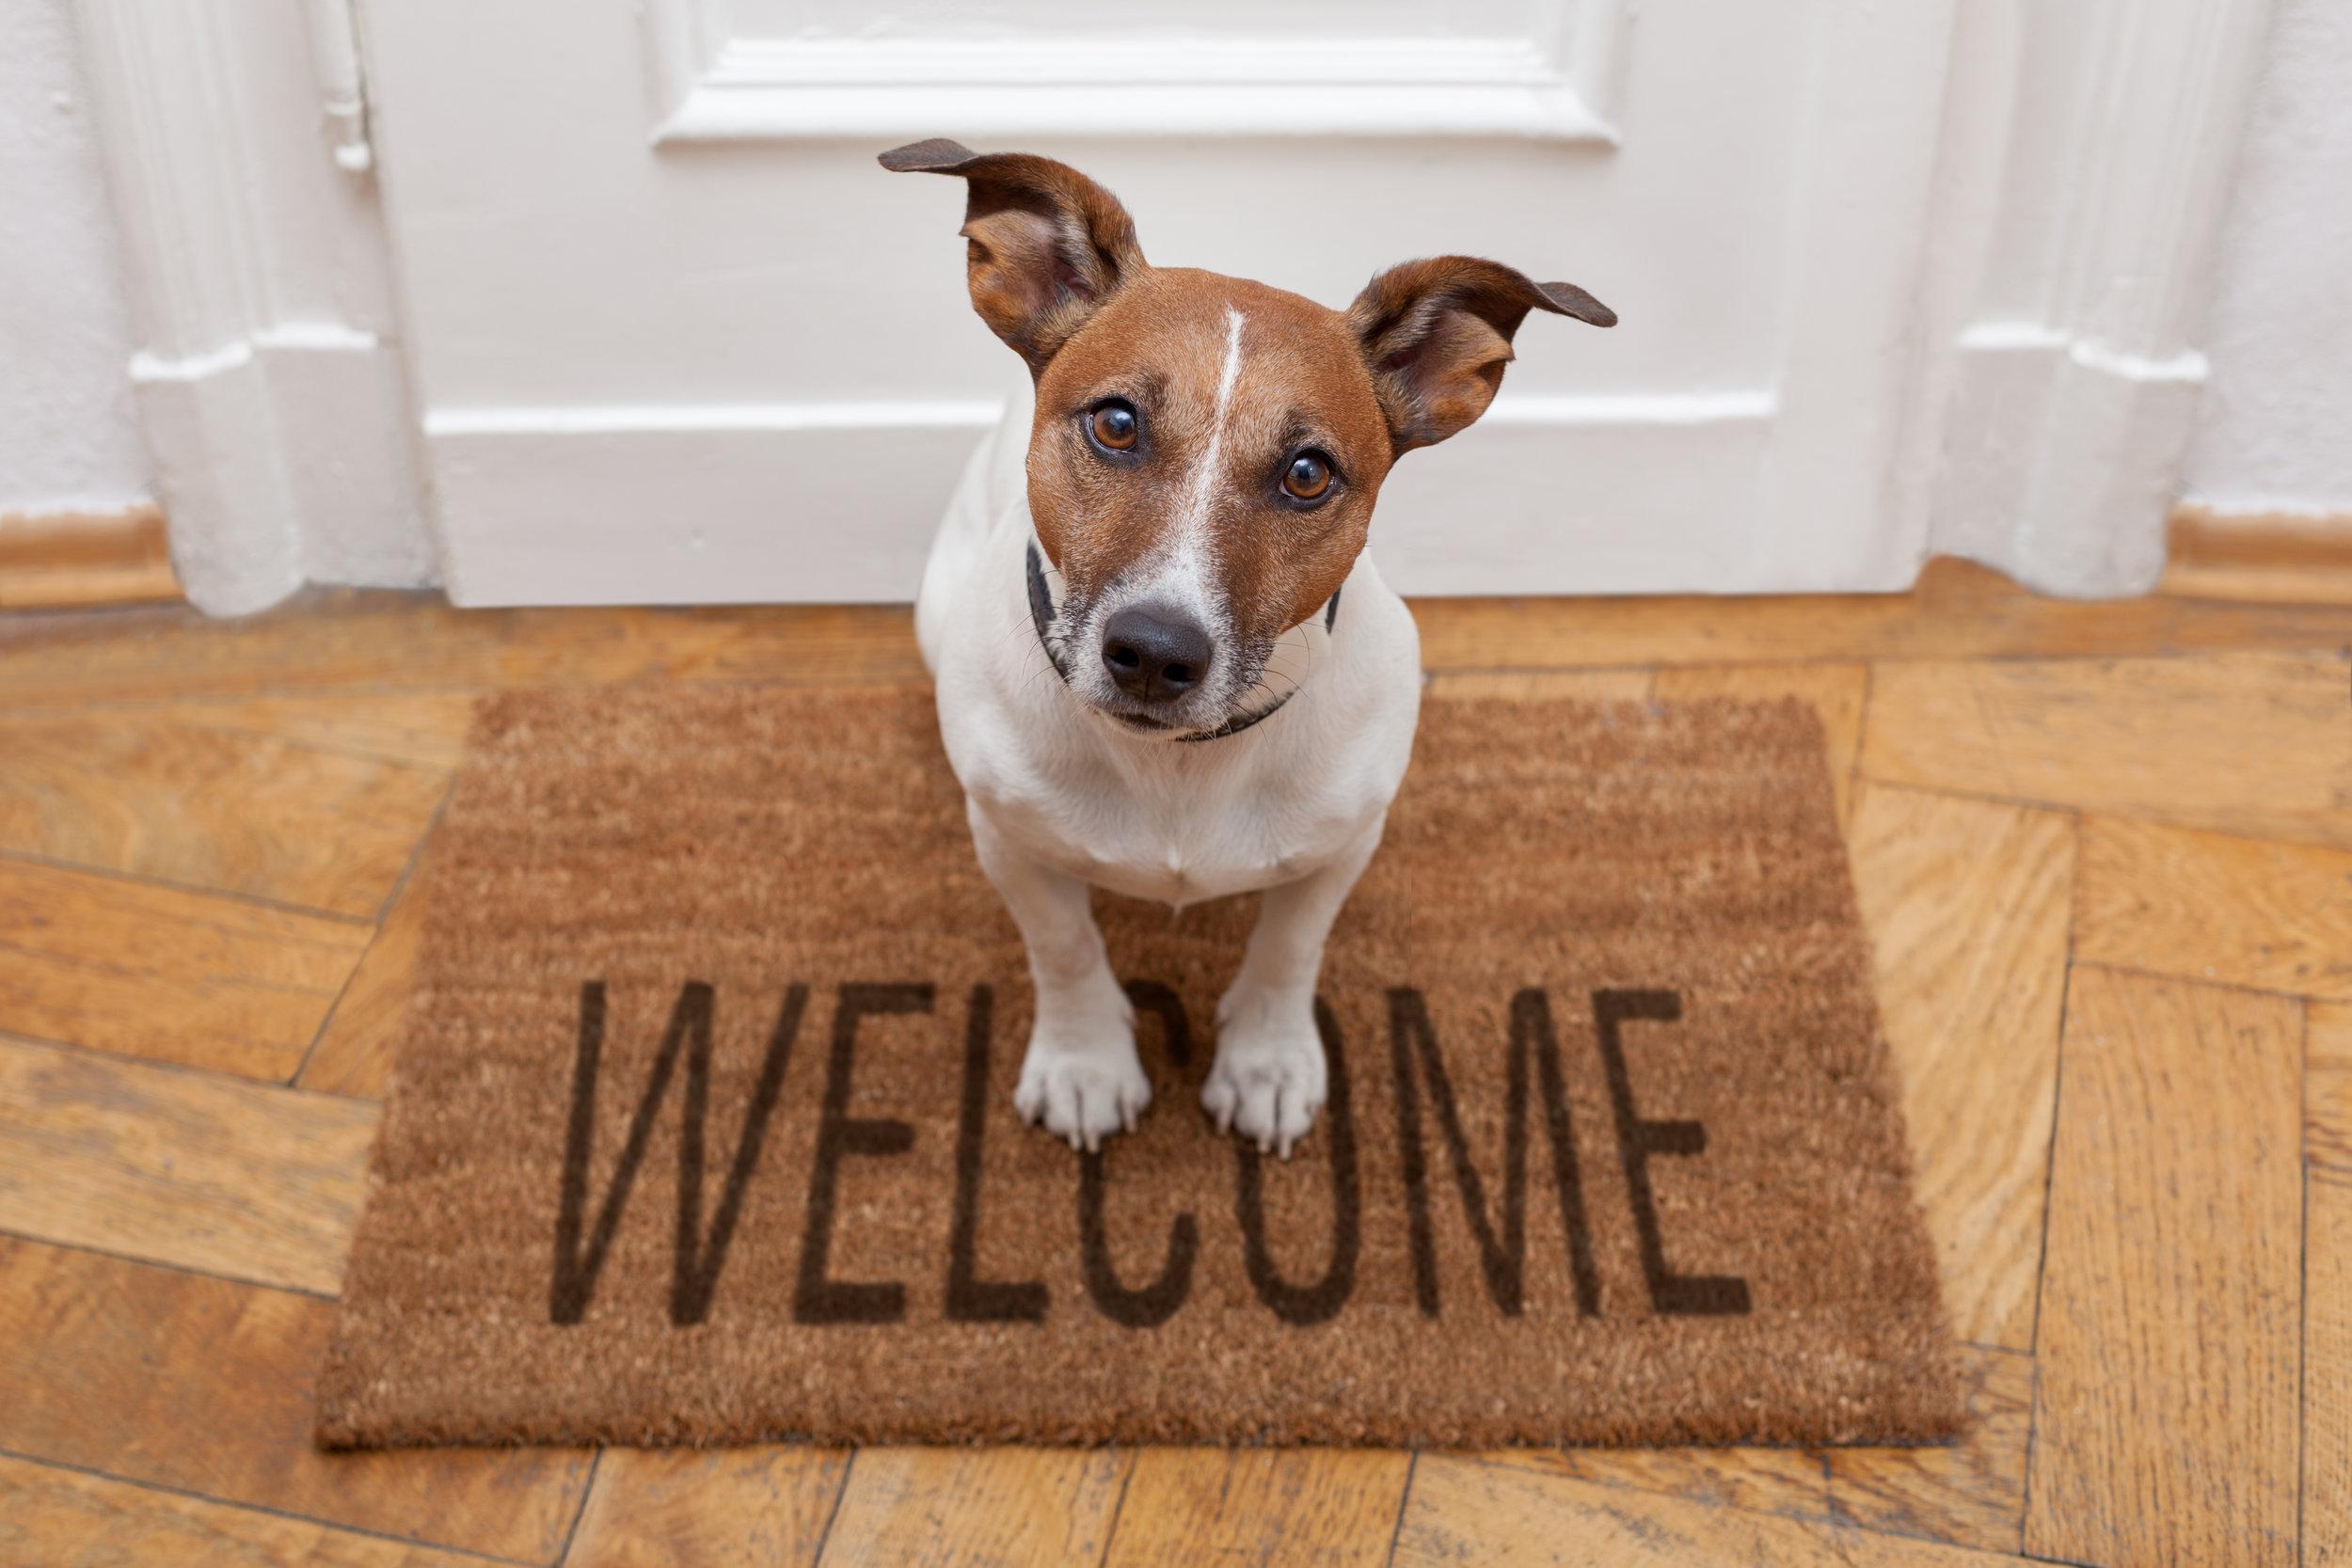 bigstock-Dog-Welcome-Home-36814013.jpg